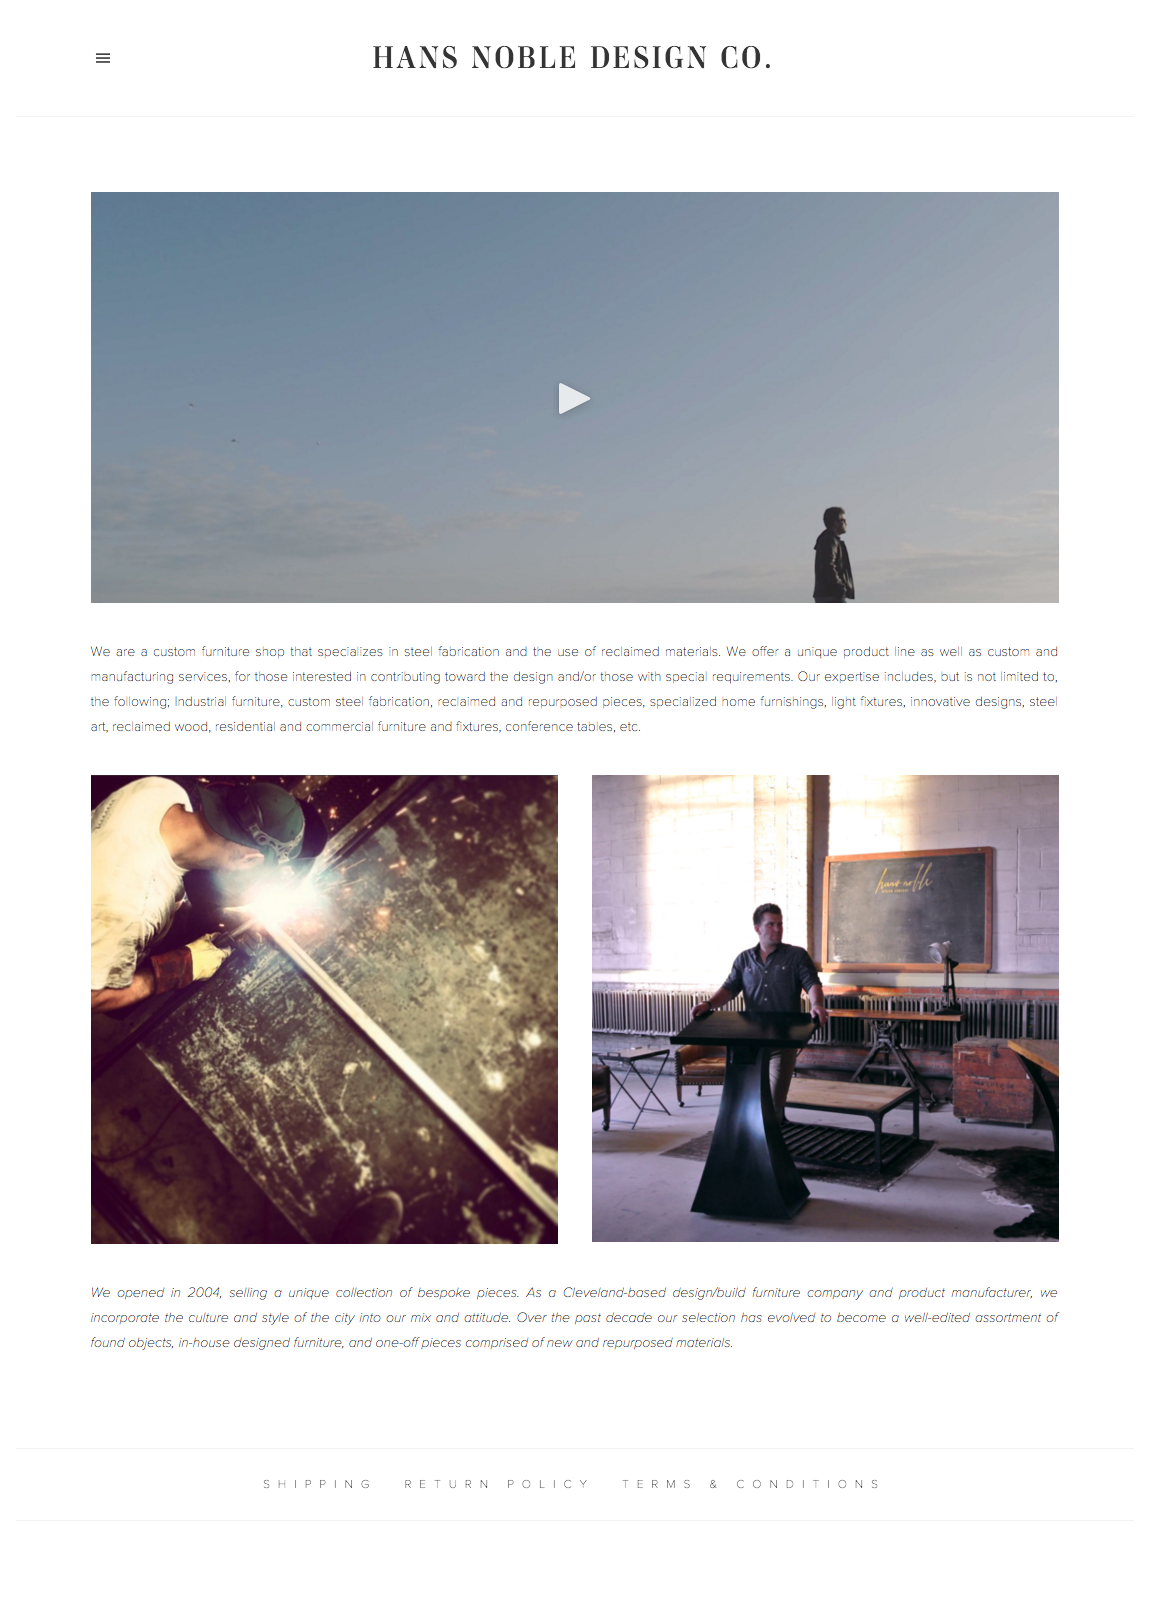 screenshot-www.hansnobledesign.com 2016-03-11 22-52-47.png